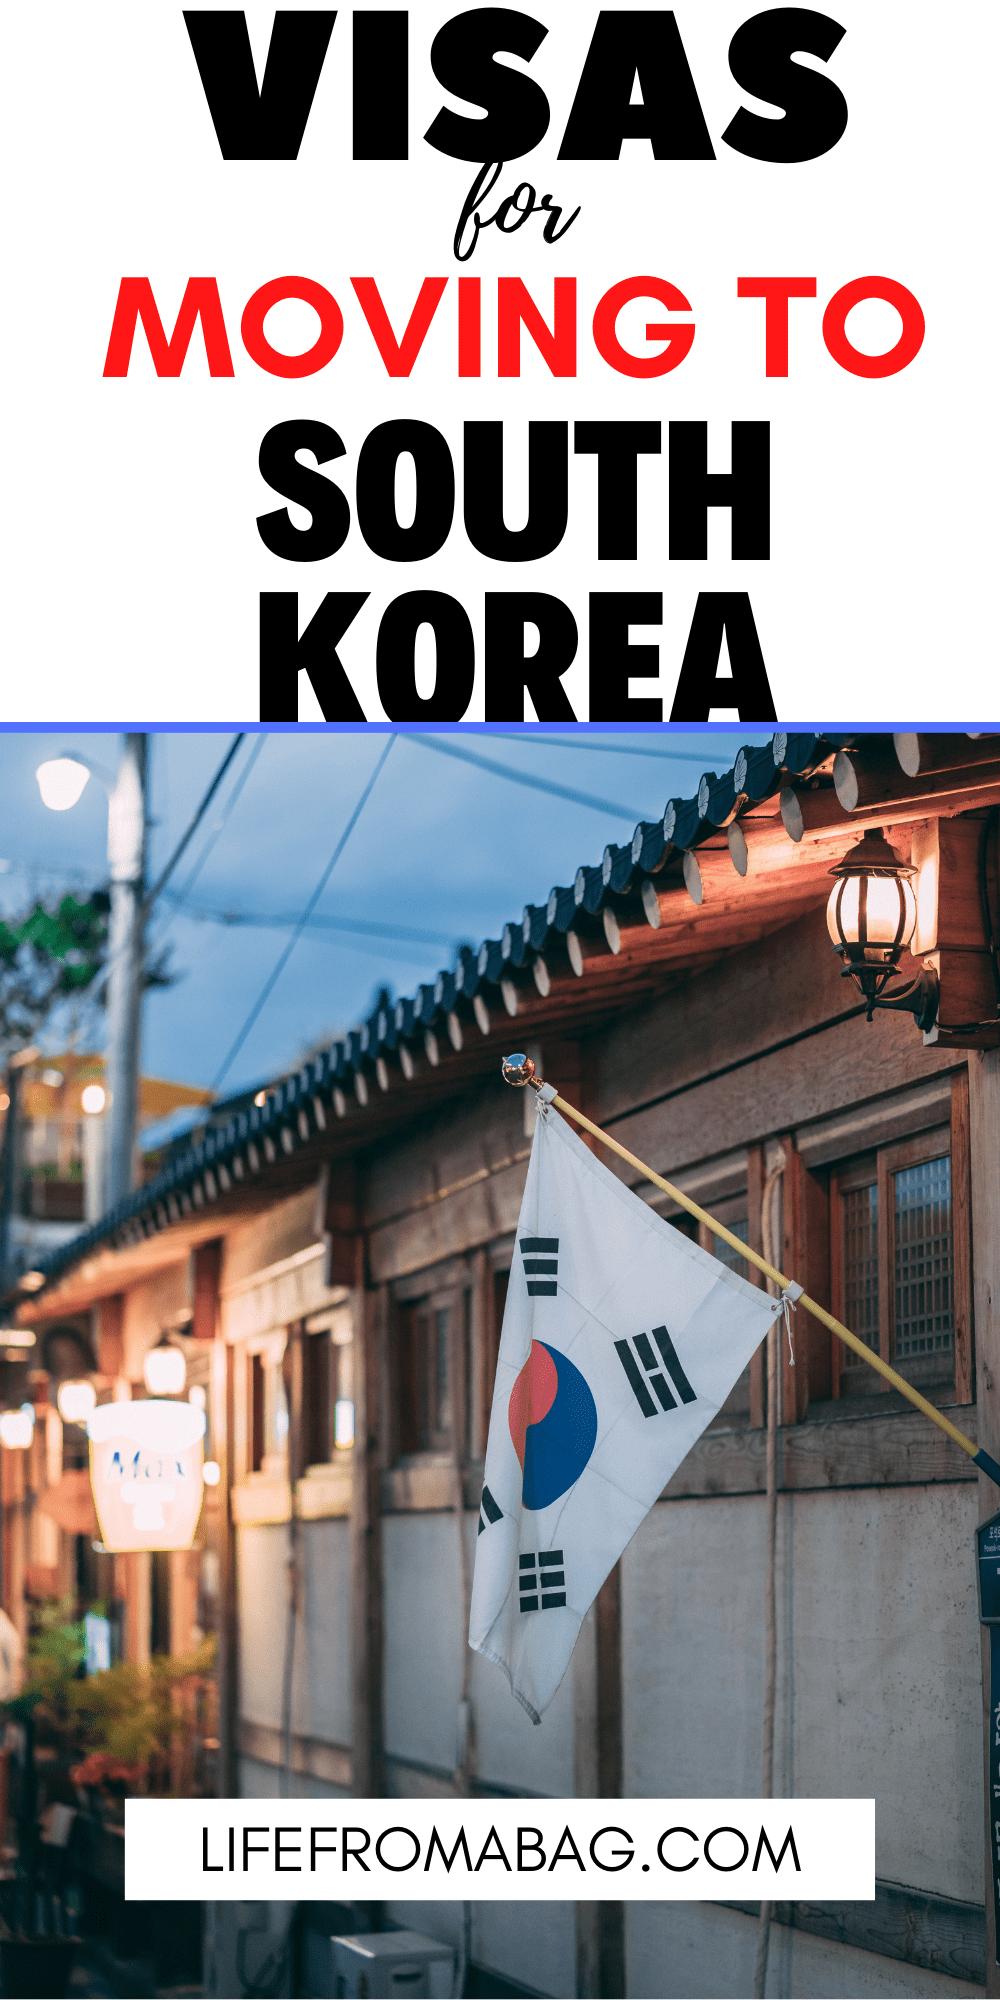 Move to South Korea